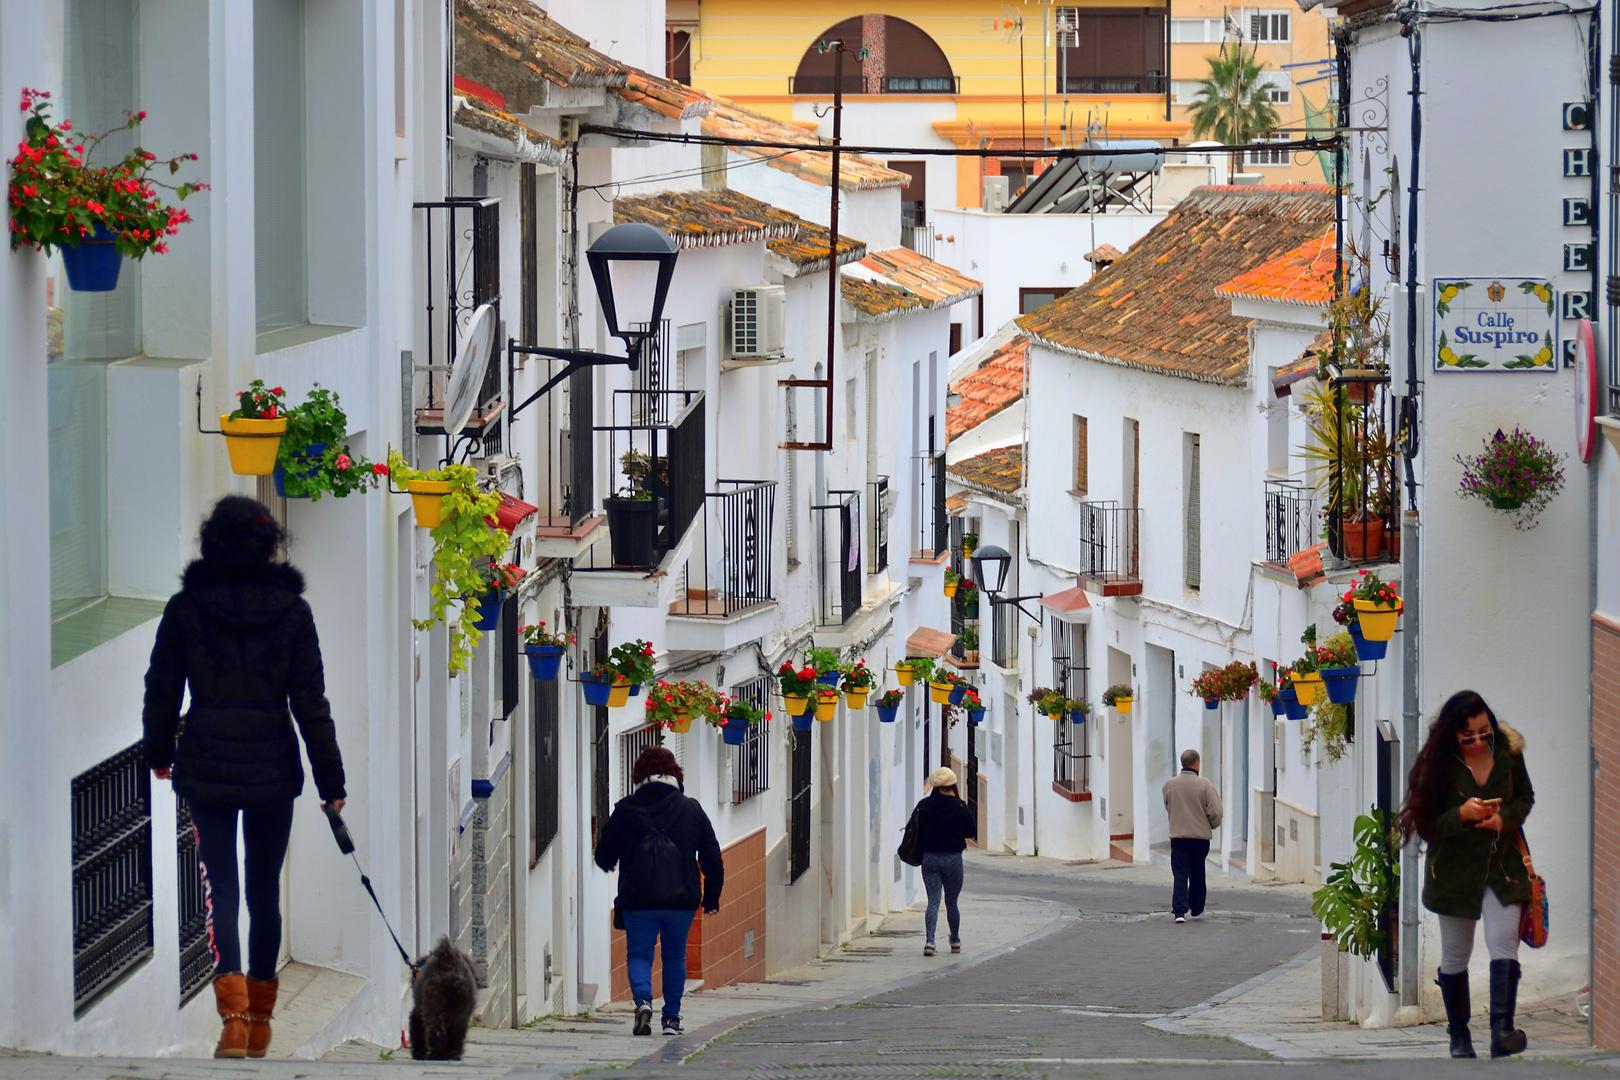 Februar in Andalusien